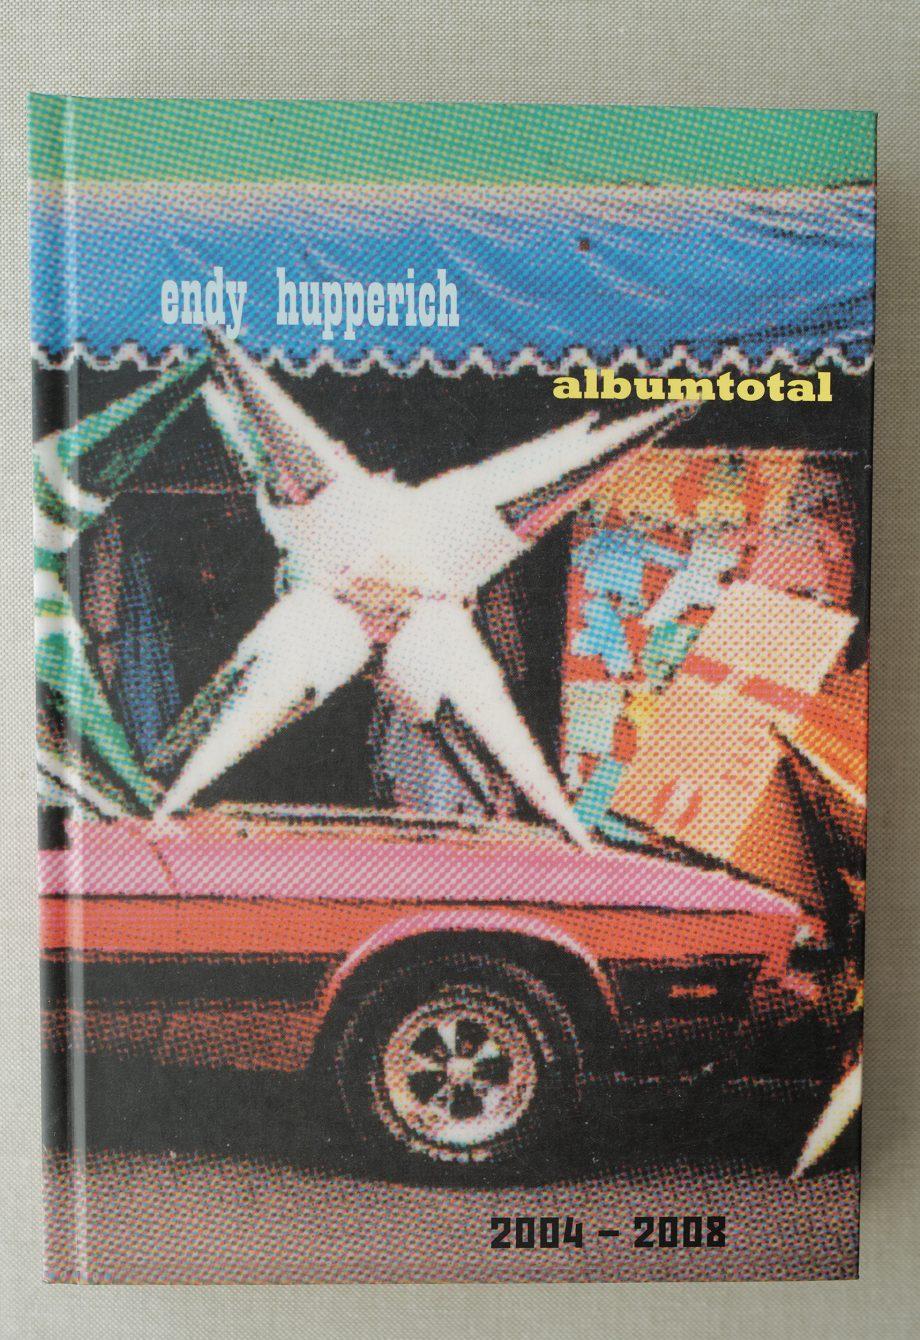 Endy Hupperich Albumtotal. Buchcover